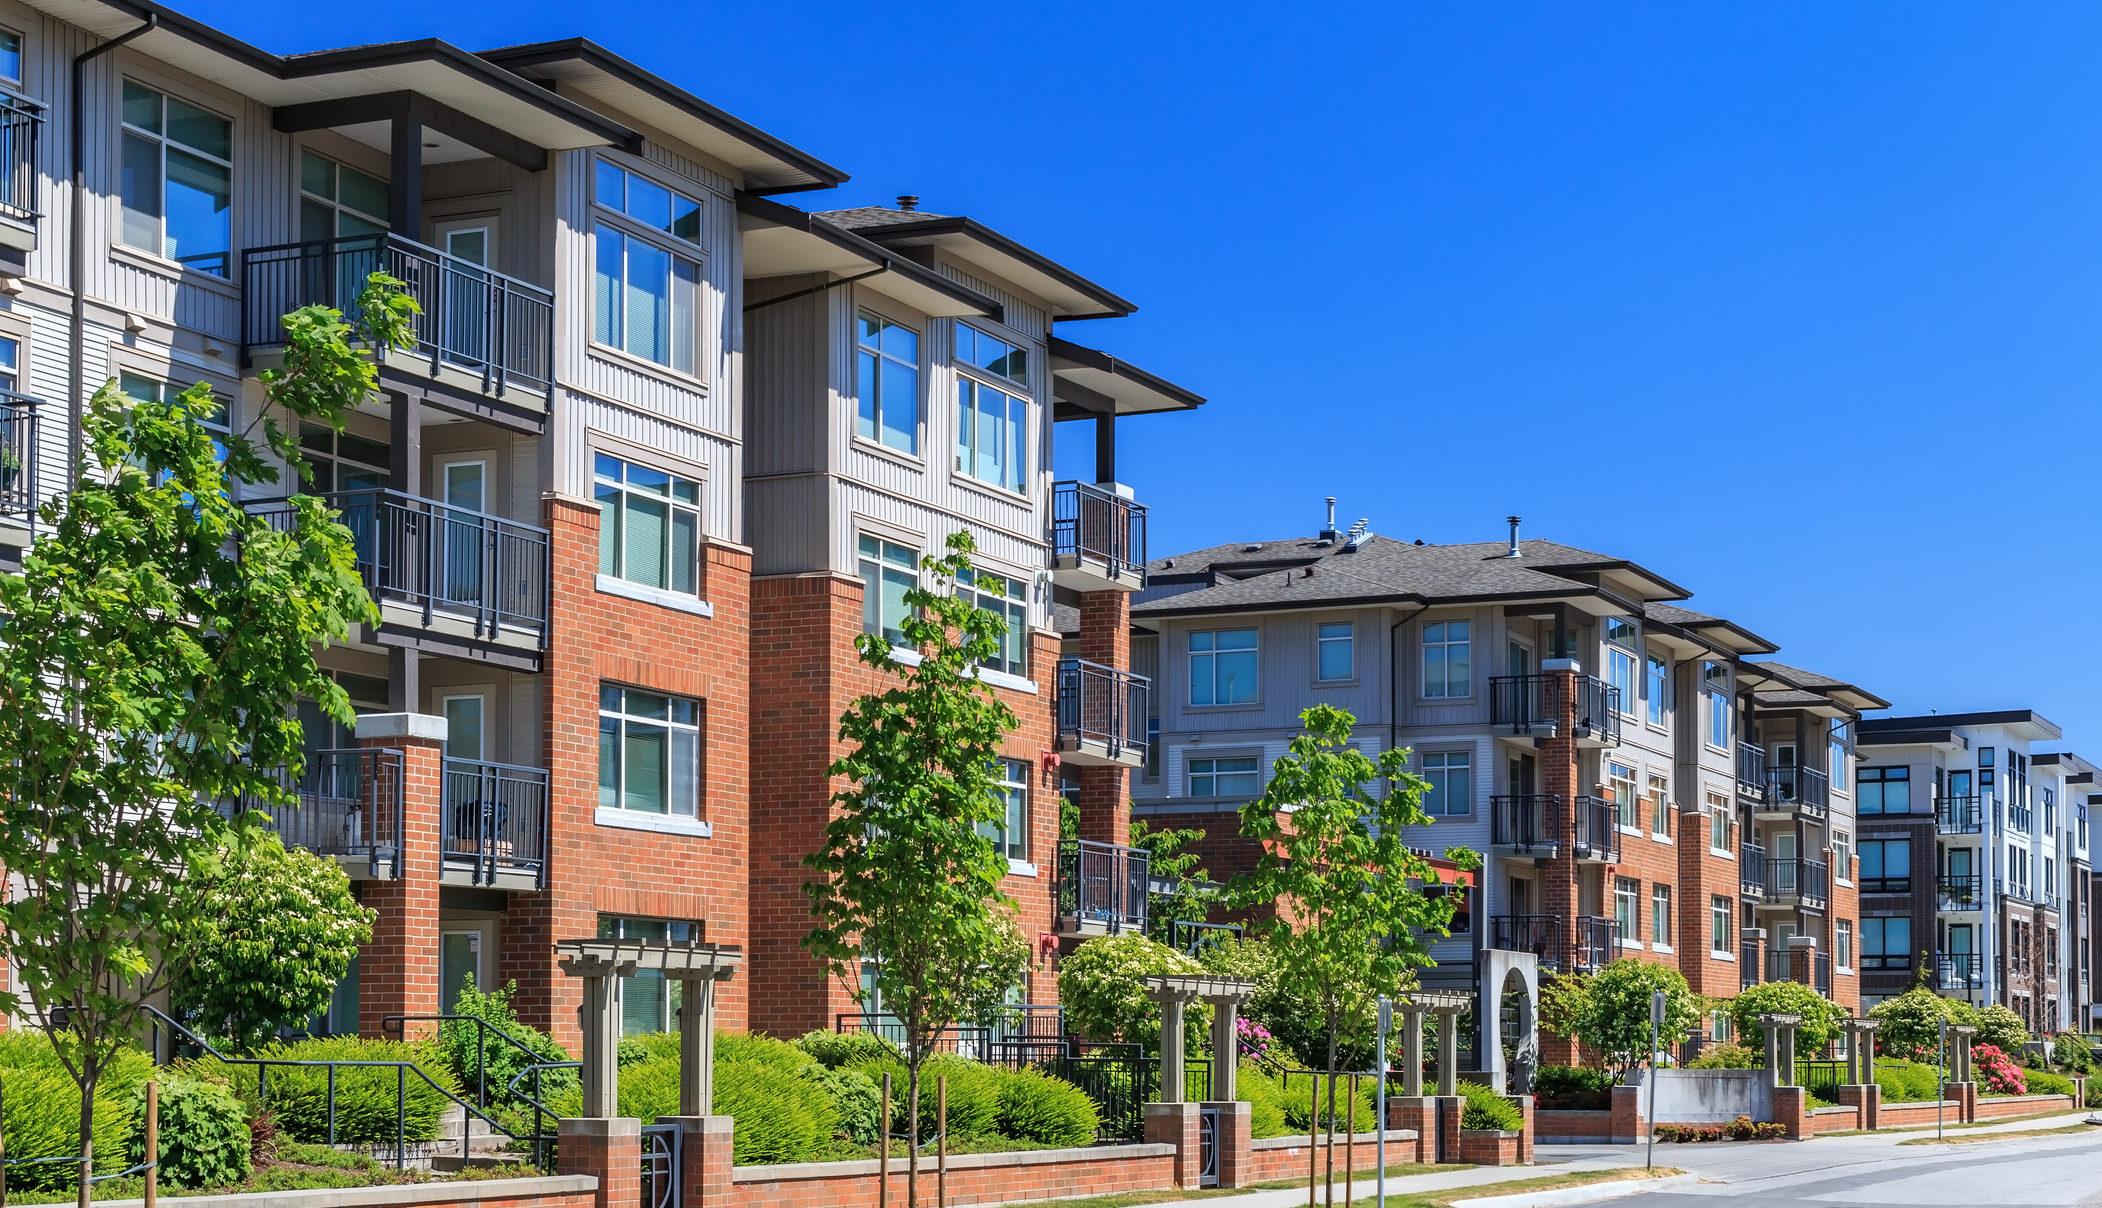 Commercial Real Estate Buckhead